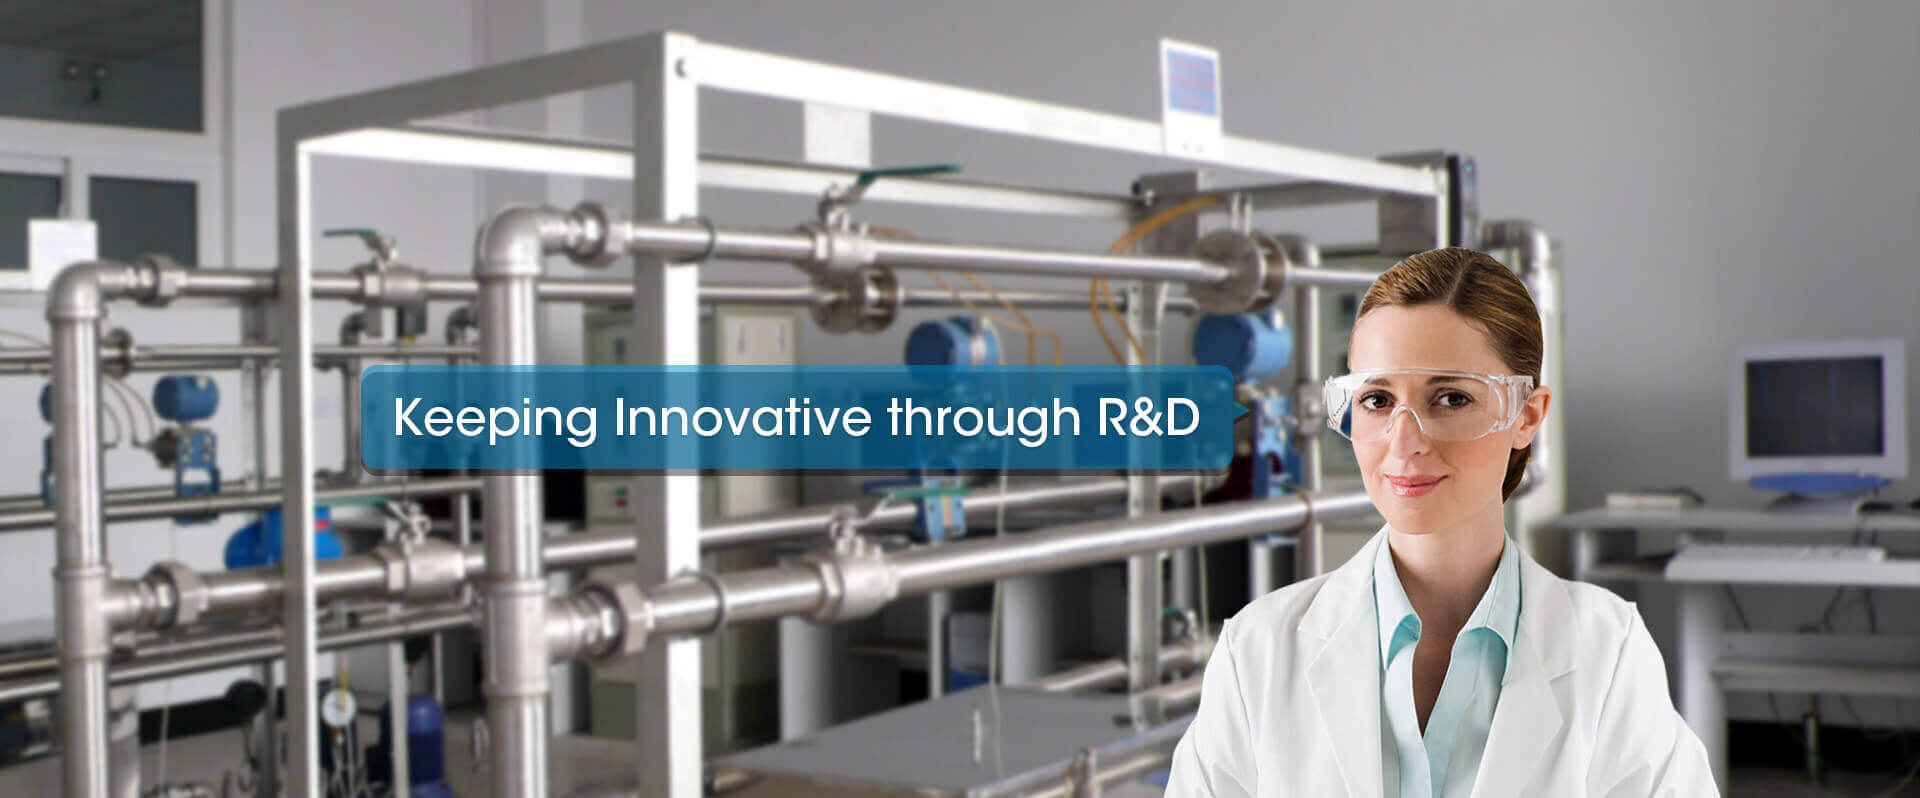 R&D-Chemical Plant